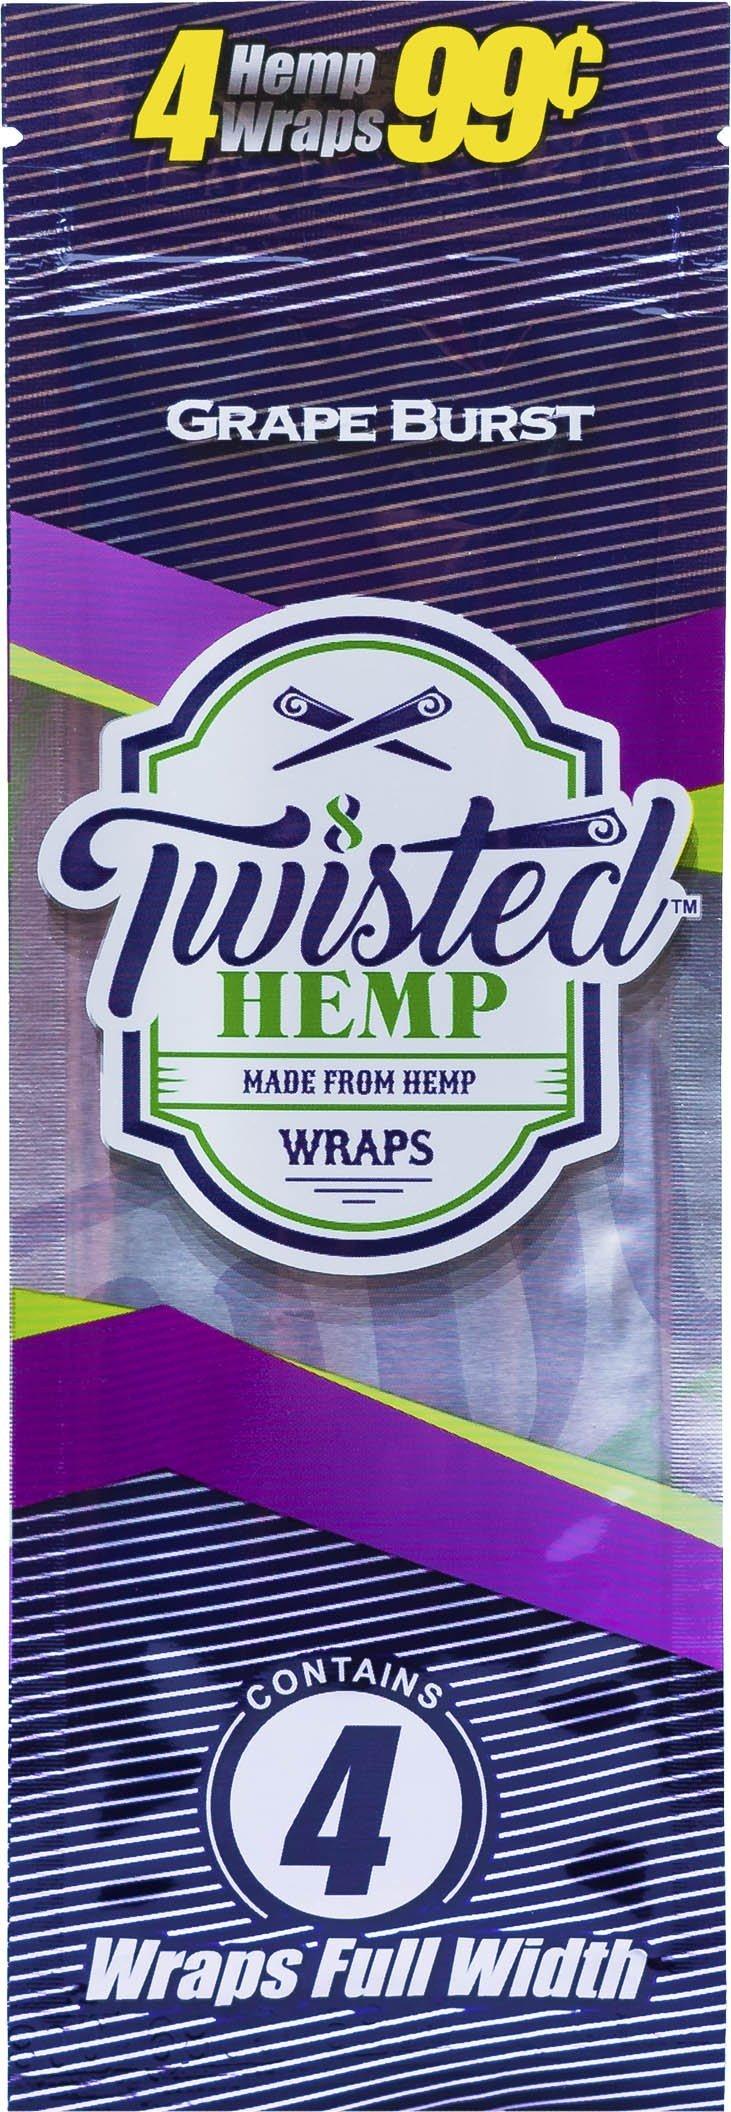 15 pk Twisted Hemp Wrap Grape Burst 4 leaf per pk